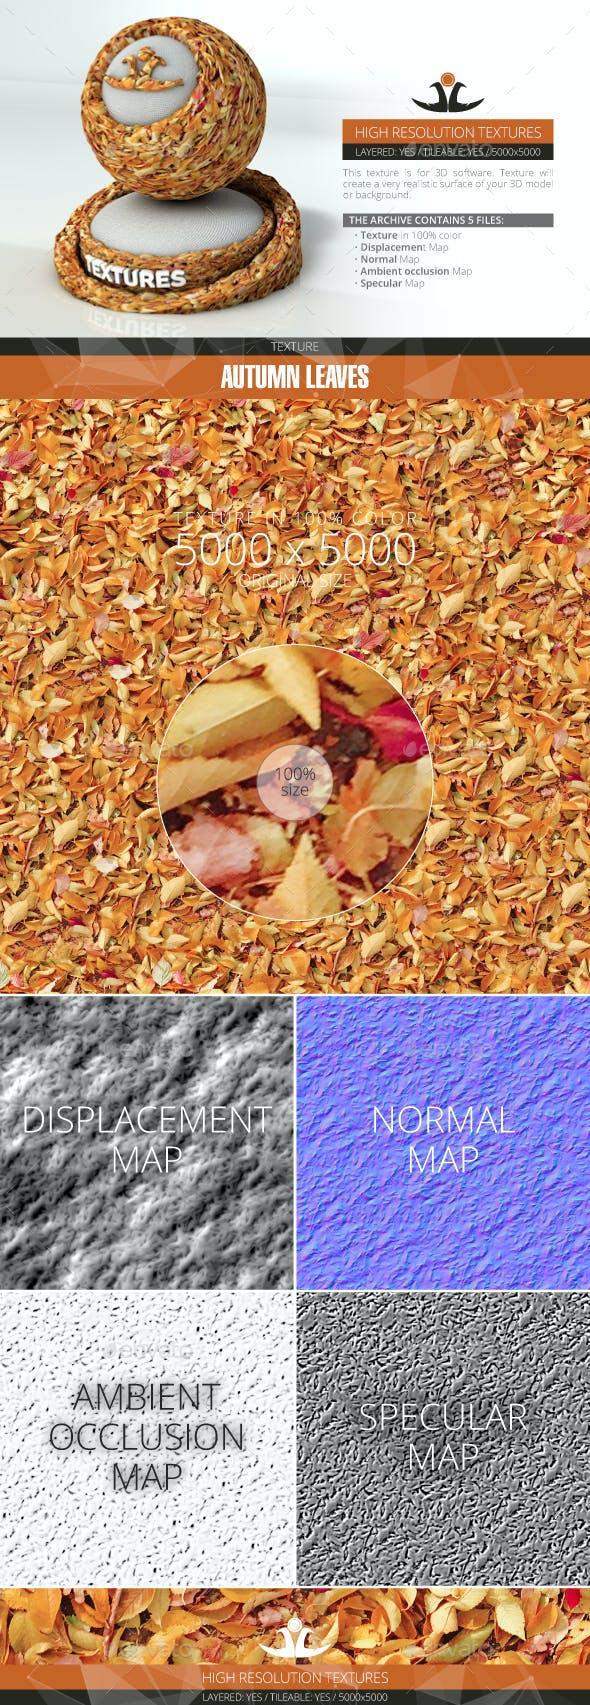 Autumn Leaves 7 - 3DOcean Item for Sale